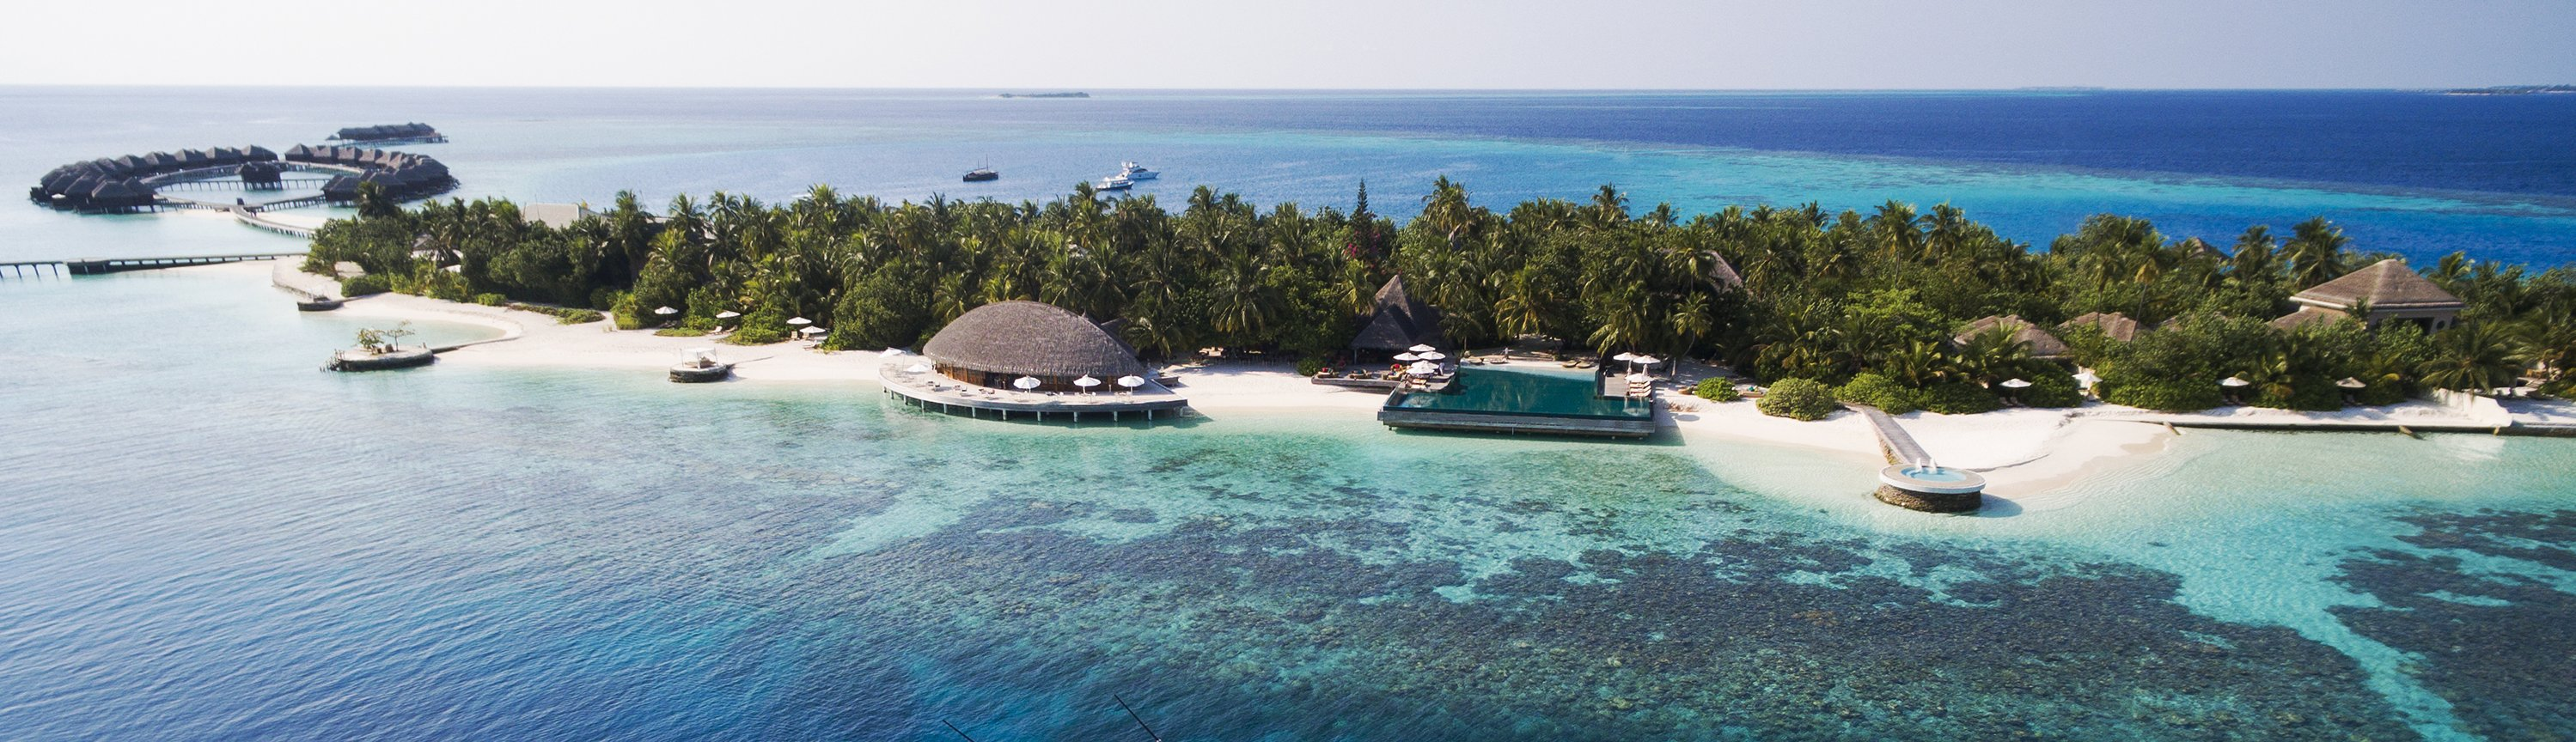 huvafen-fushi-maldives-aerial-view